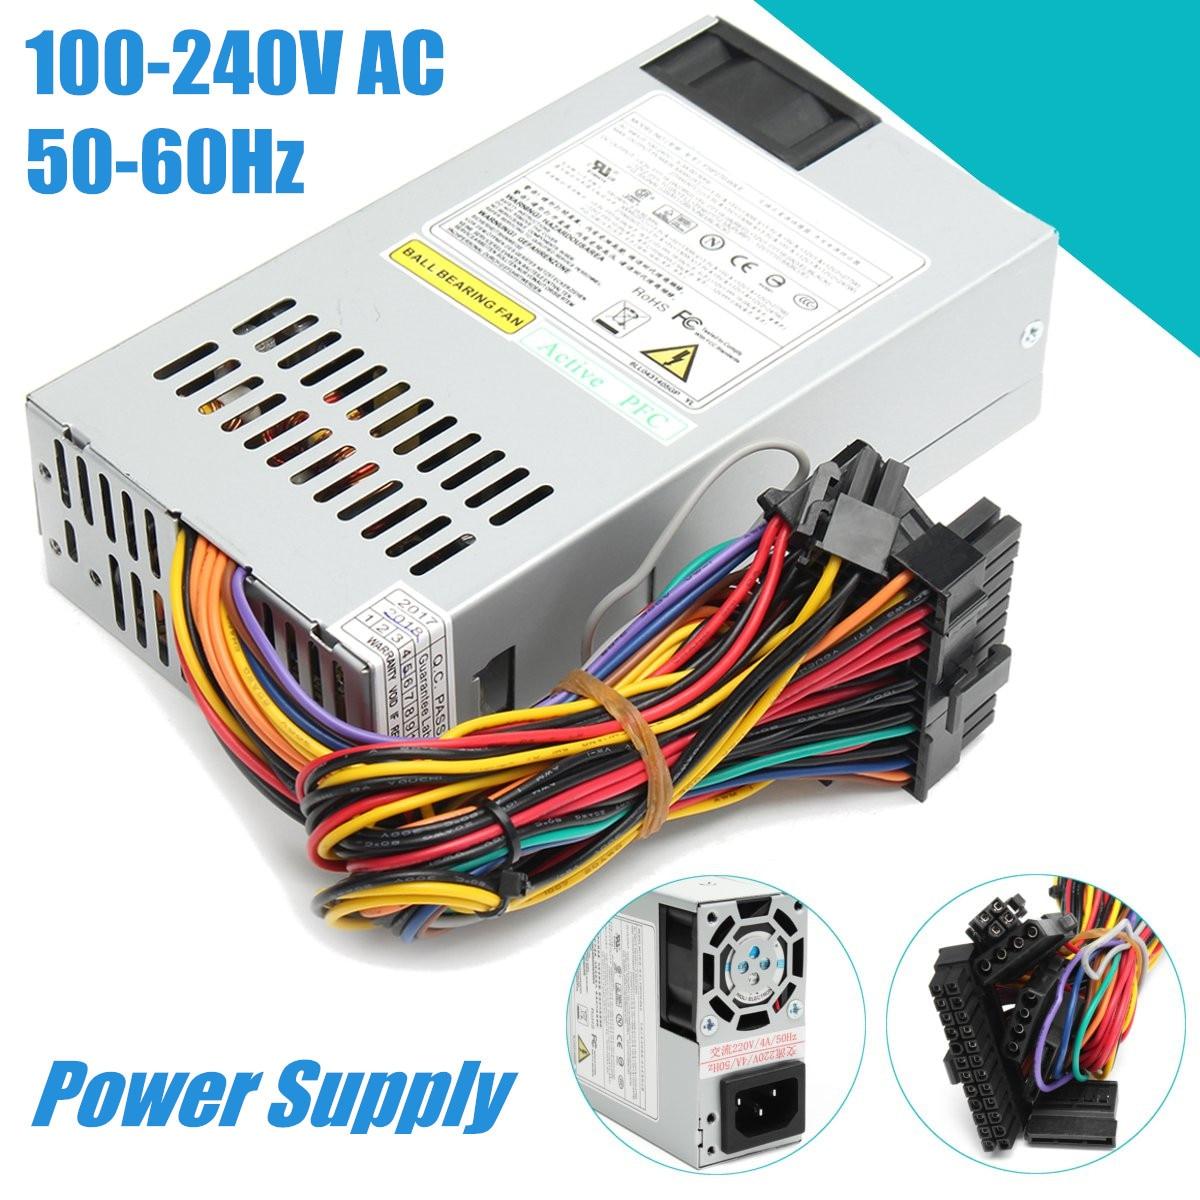 Computer Power Supply 1U FSP270 100-240V AC Small Desktop Computer Cash Register узник замка иф dvd